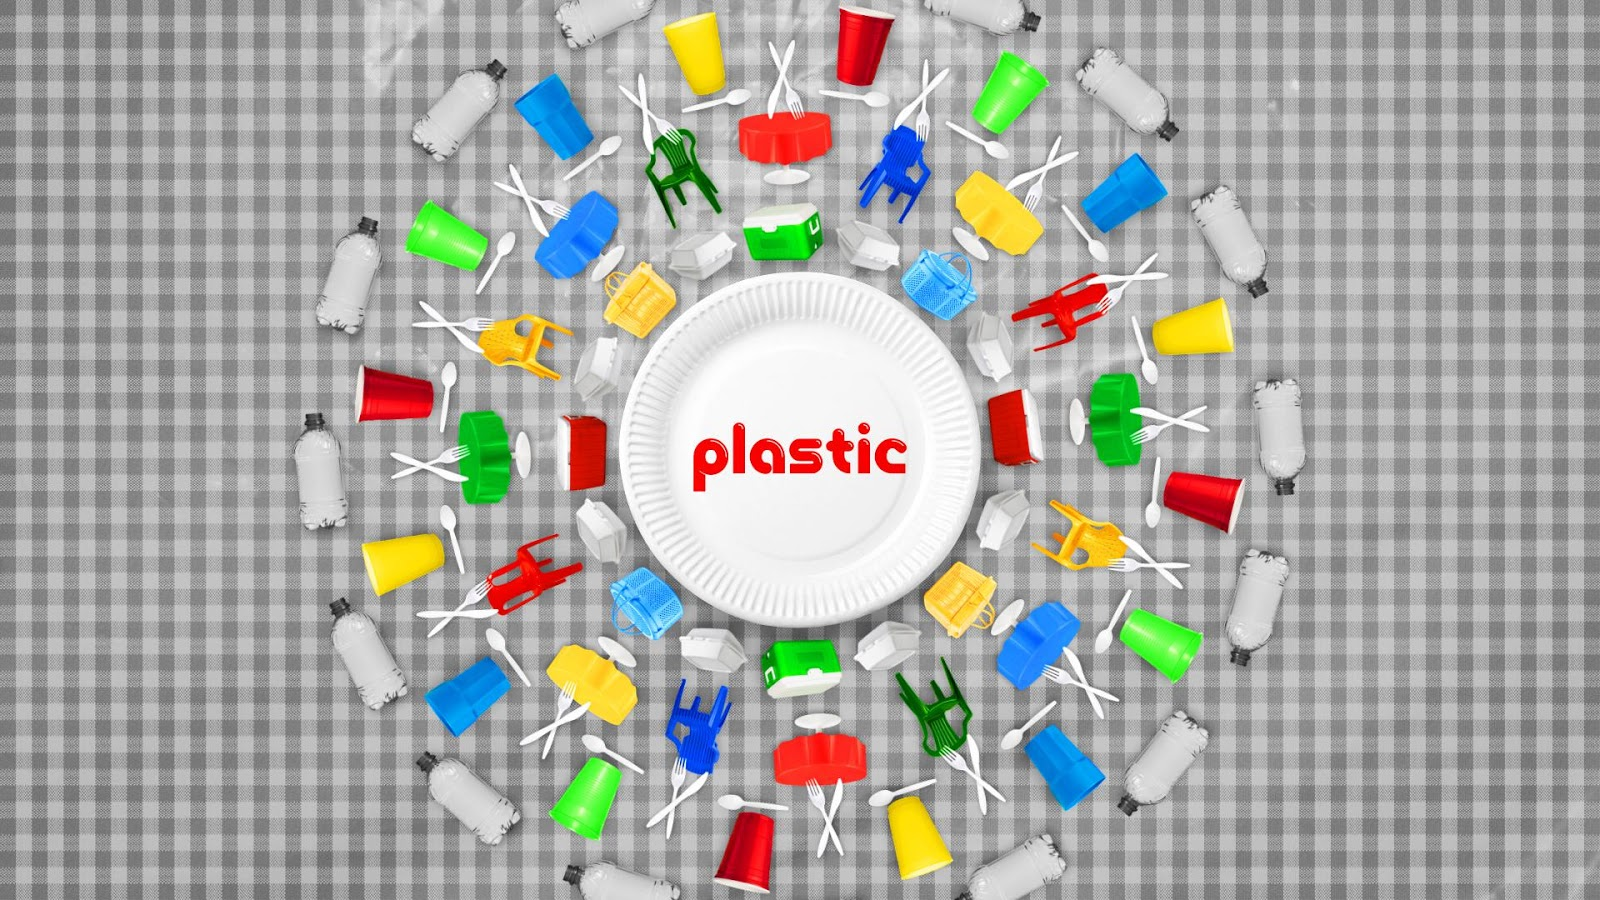 Plasticnic